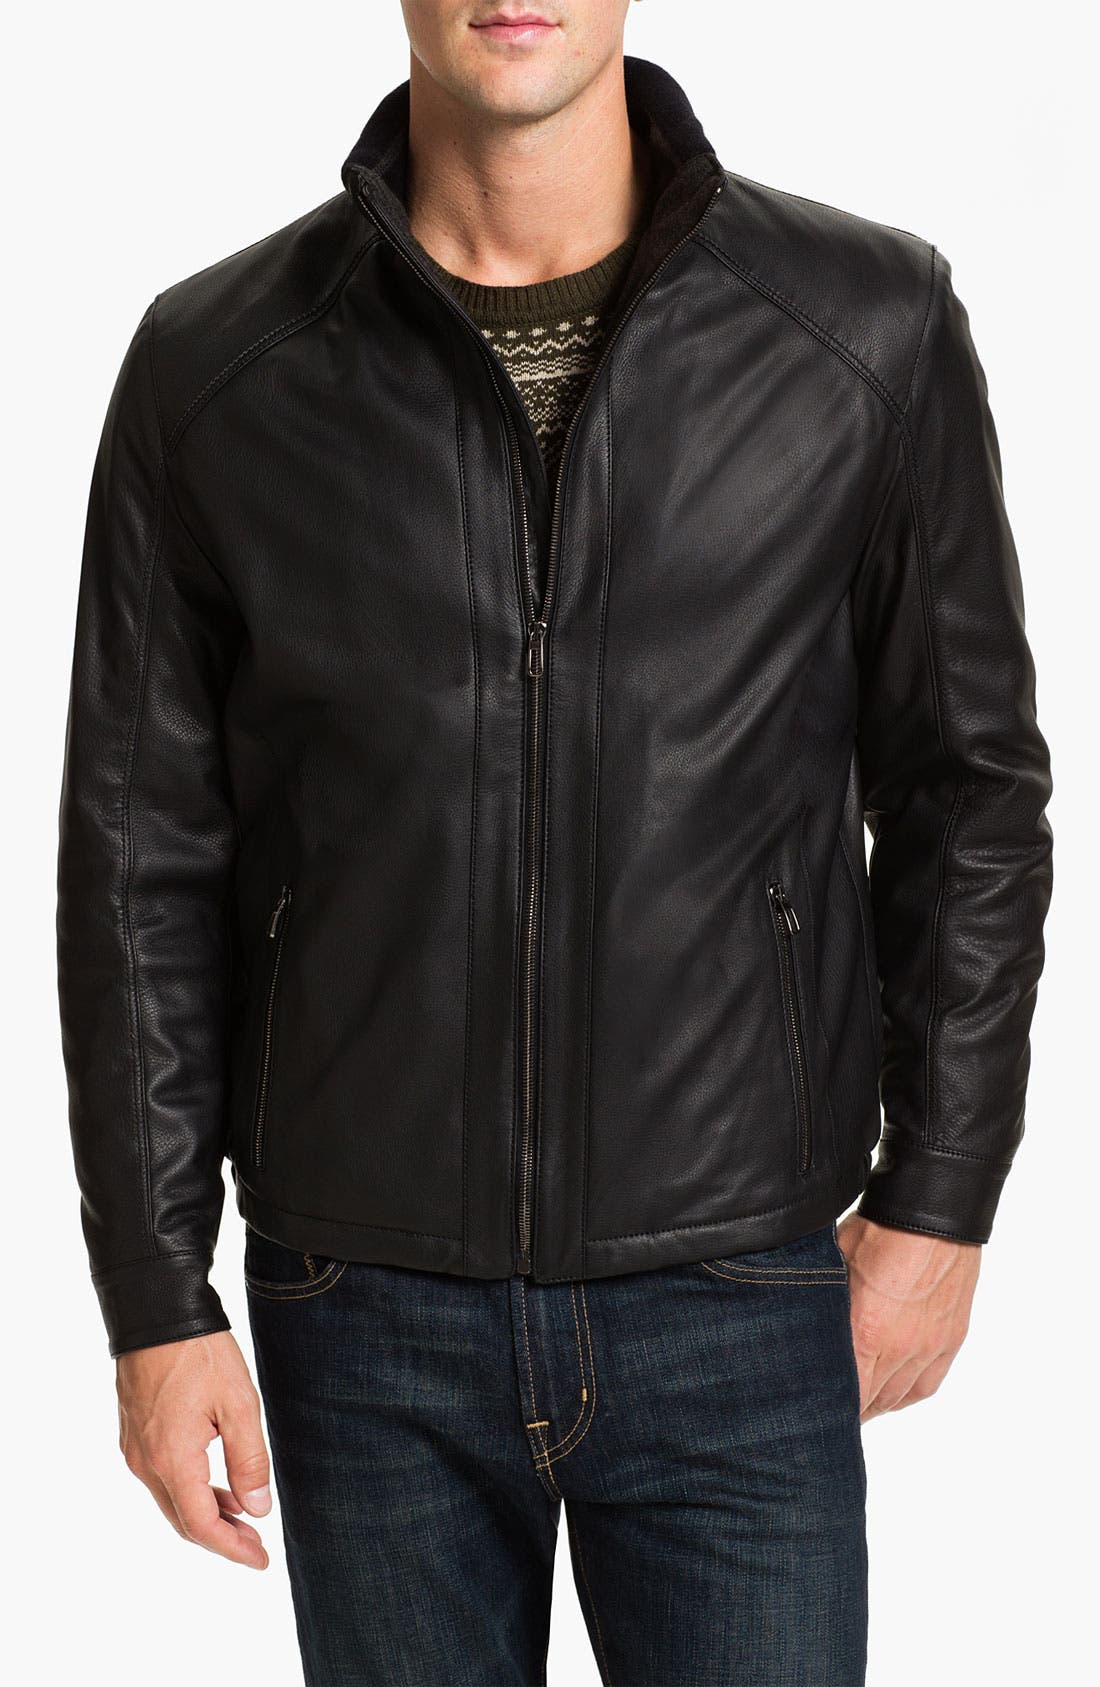 Alternate Image 1 Selected - Gian Franco Pagini Leather Jacket